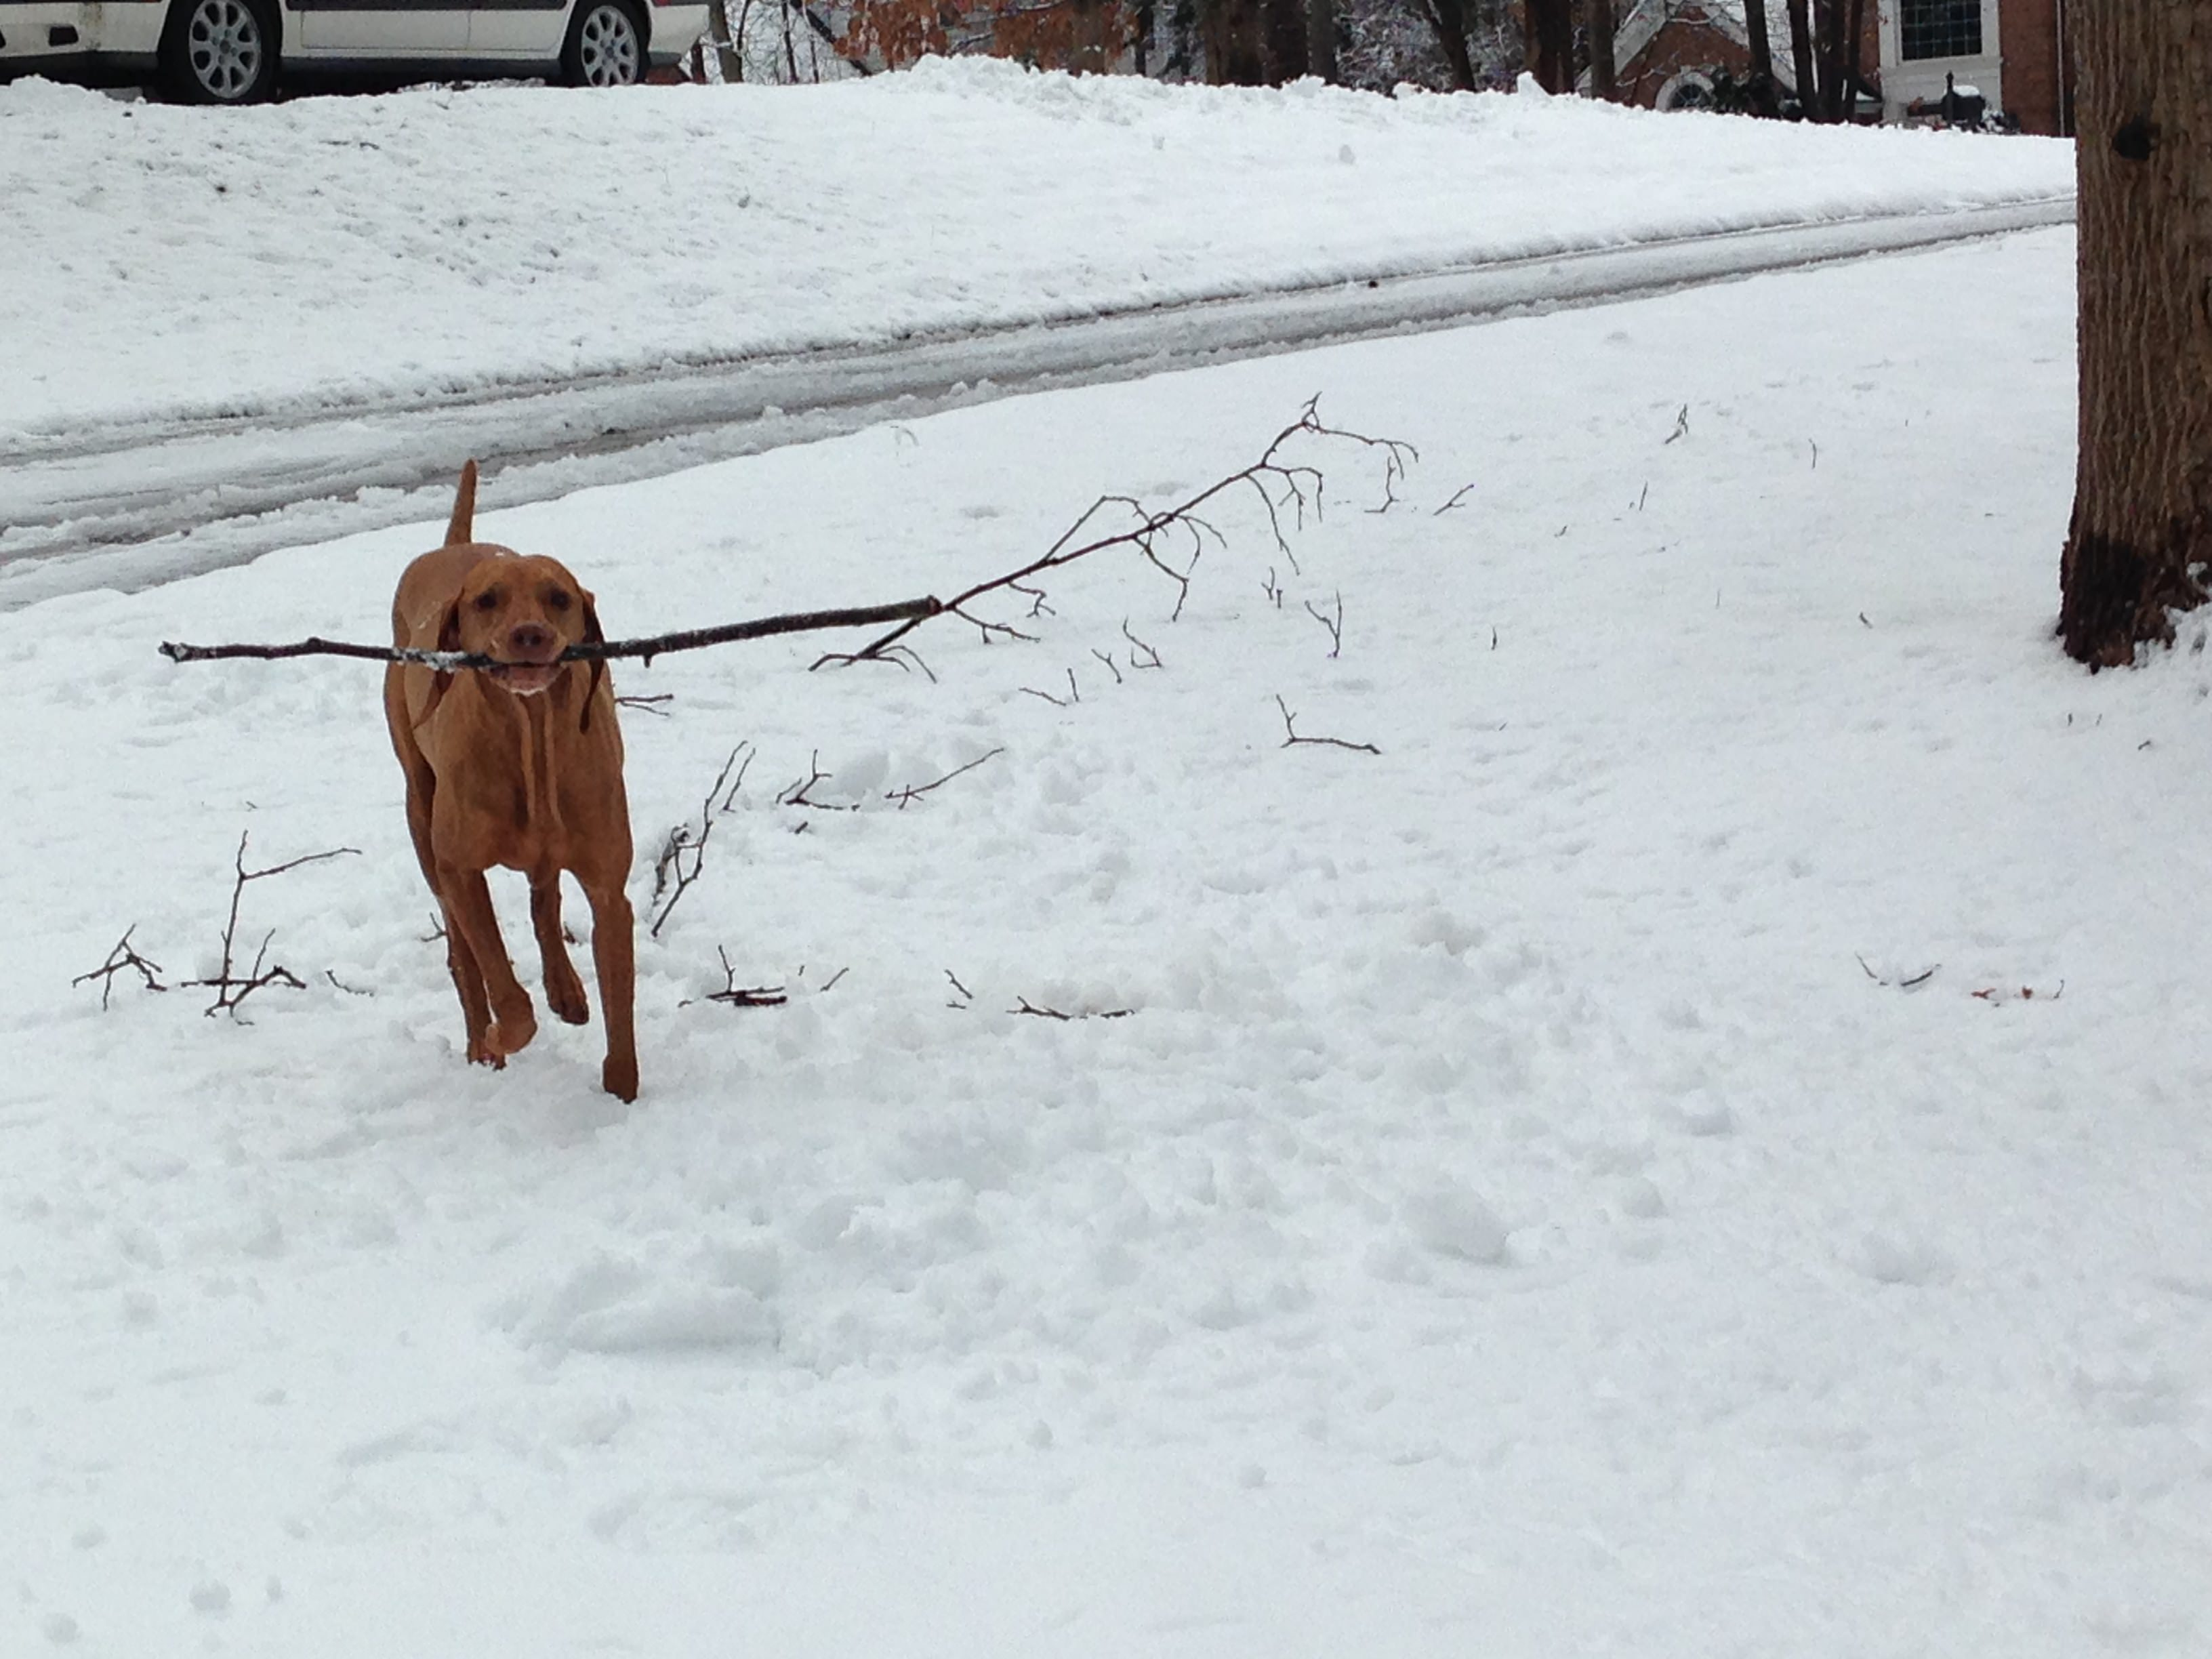 snowy vizsla